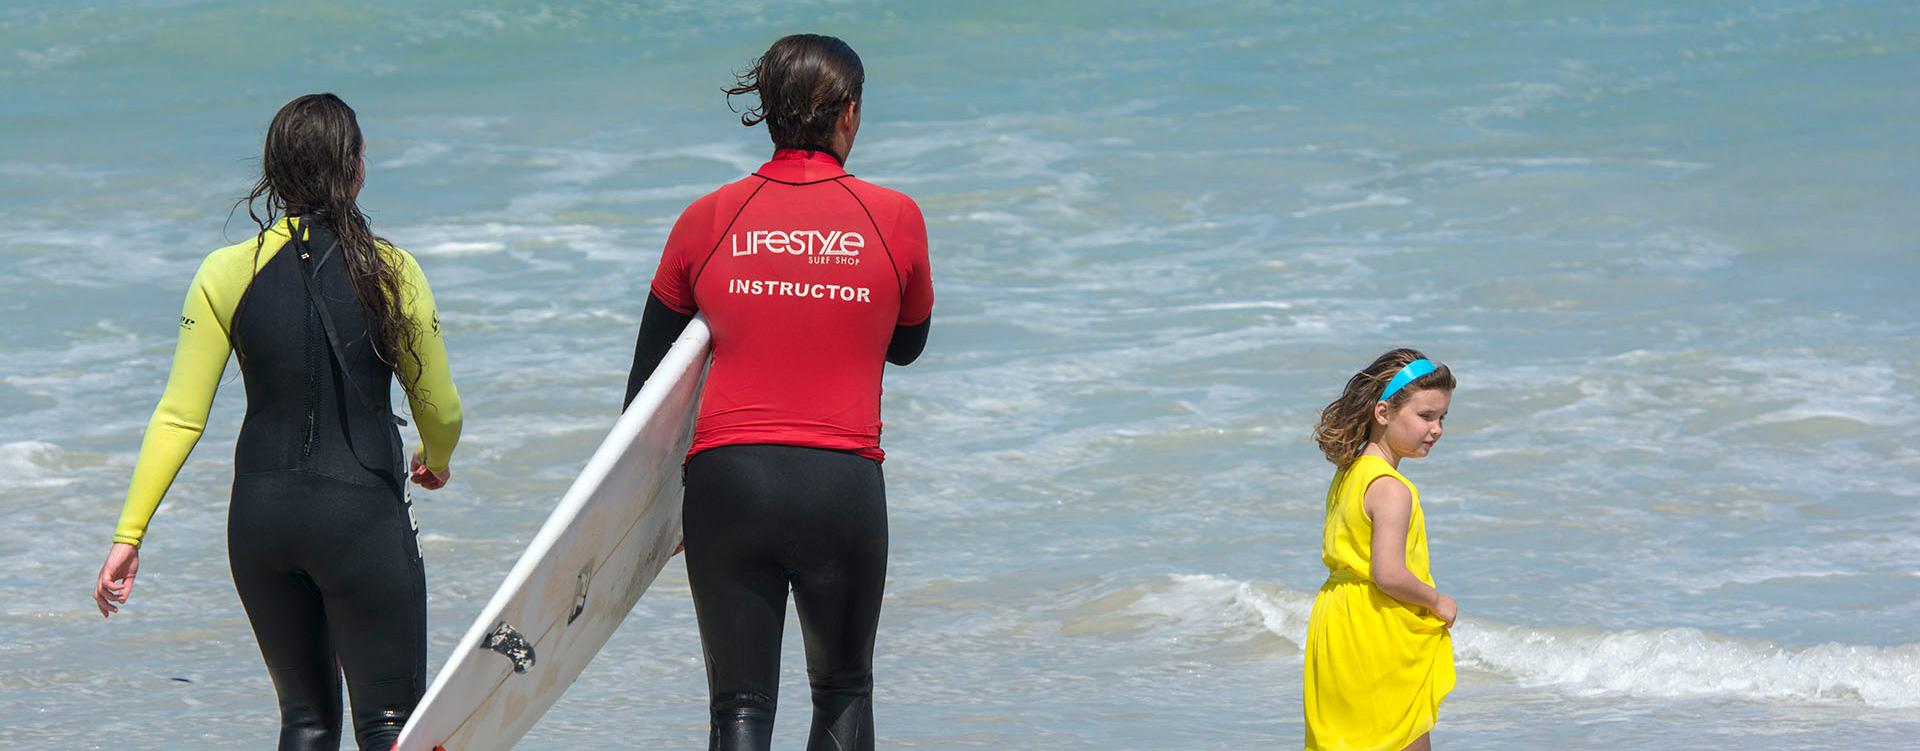 RPA - surfing